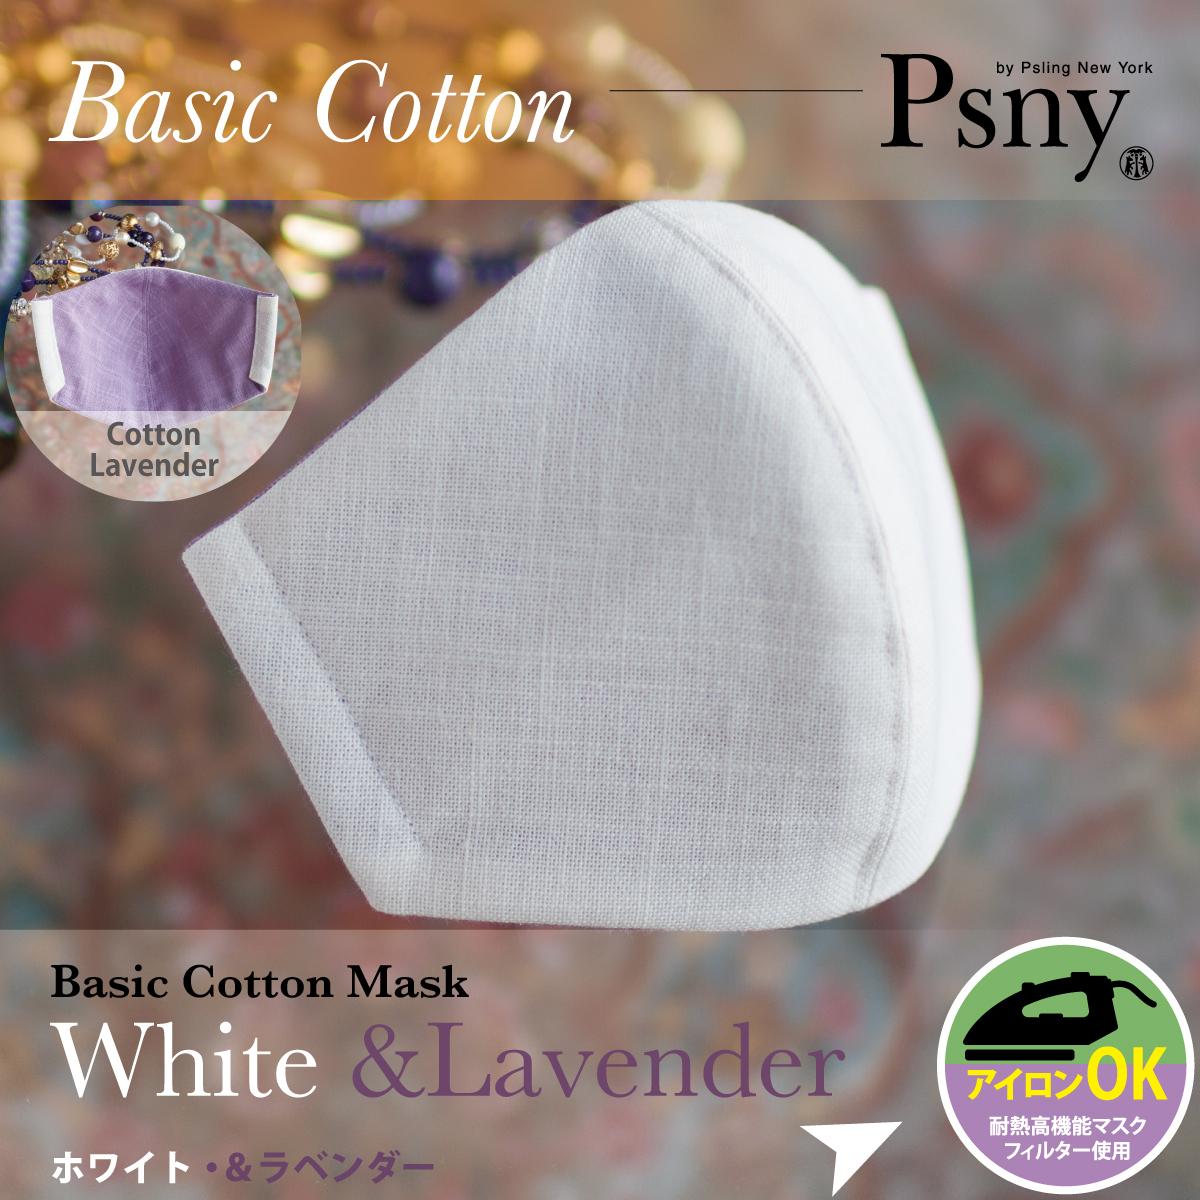 PSNY ベーシック コットン・オフホワイト&ラベンダー 花粉 黄砂 洗える不織布フィルター入り 立体 大人用 CW6 マスク 送料無料 CW6